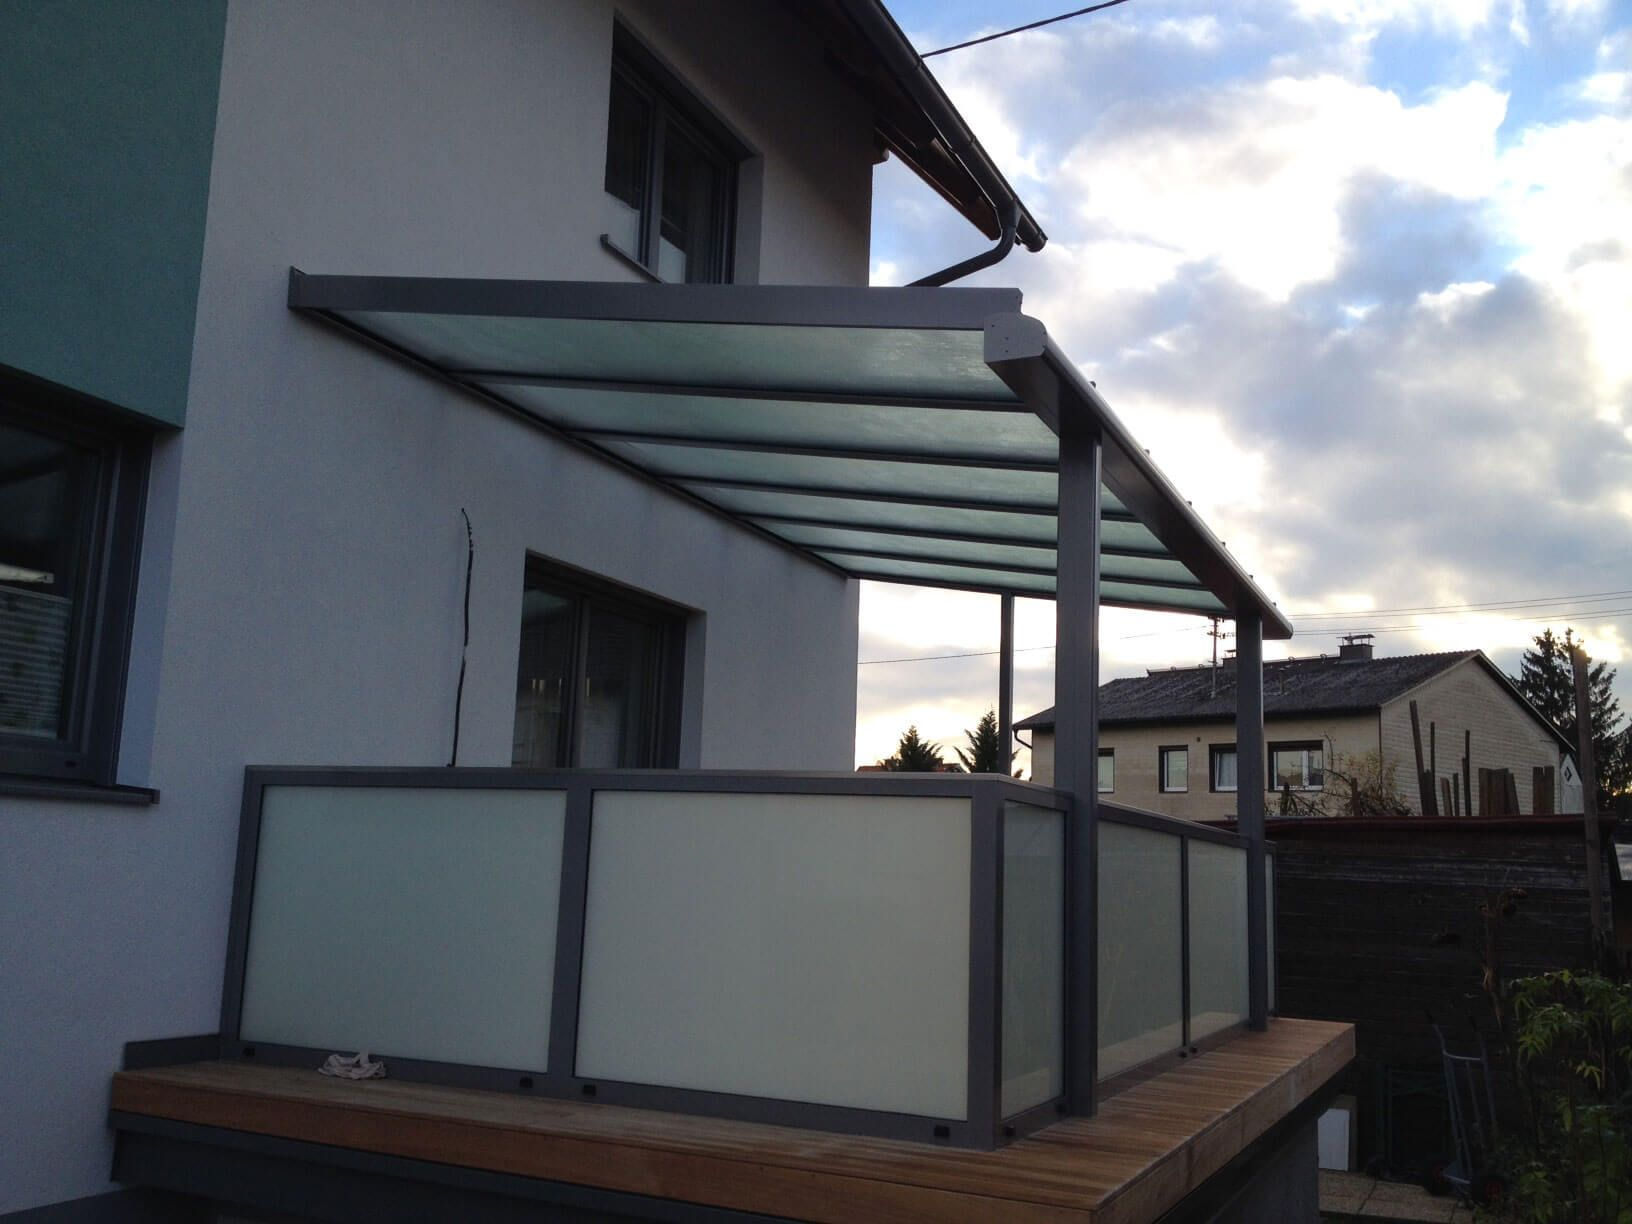 Anthrazit Graue Terrassenuberdachung My Home 3 Pinterest Glas